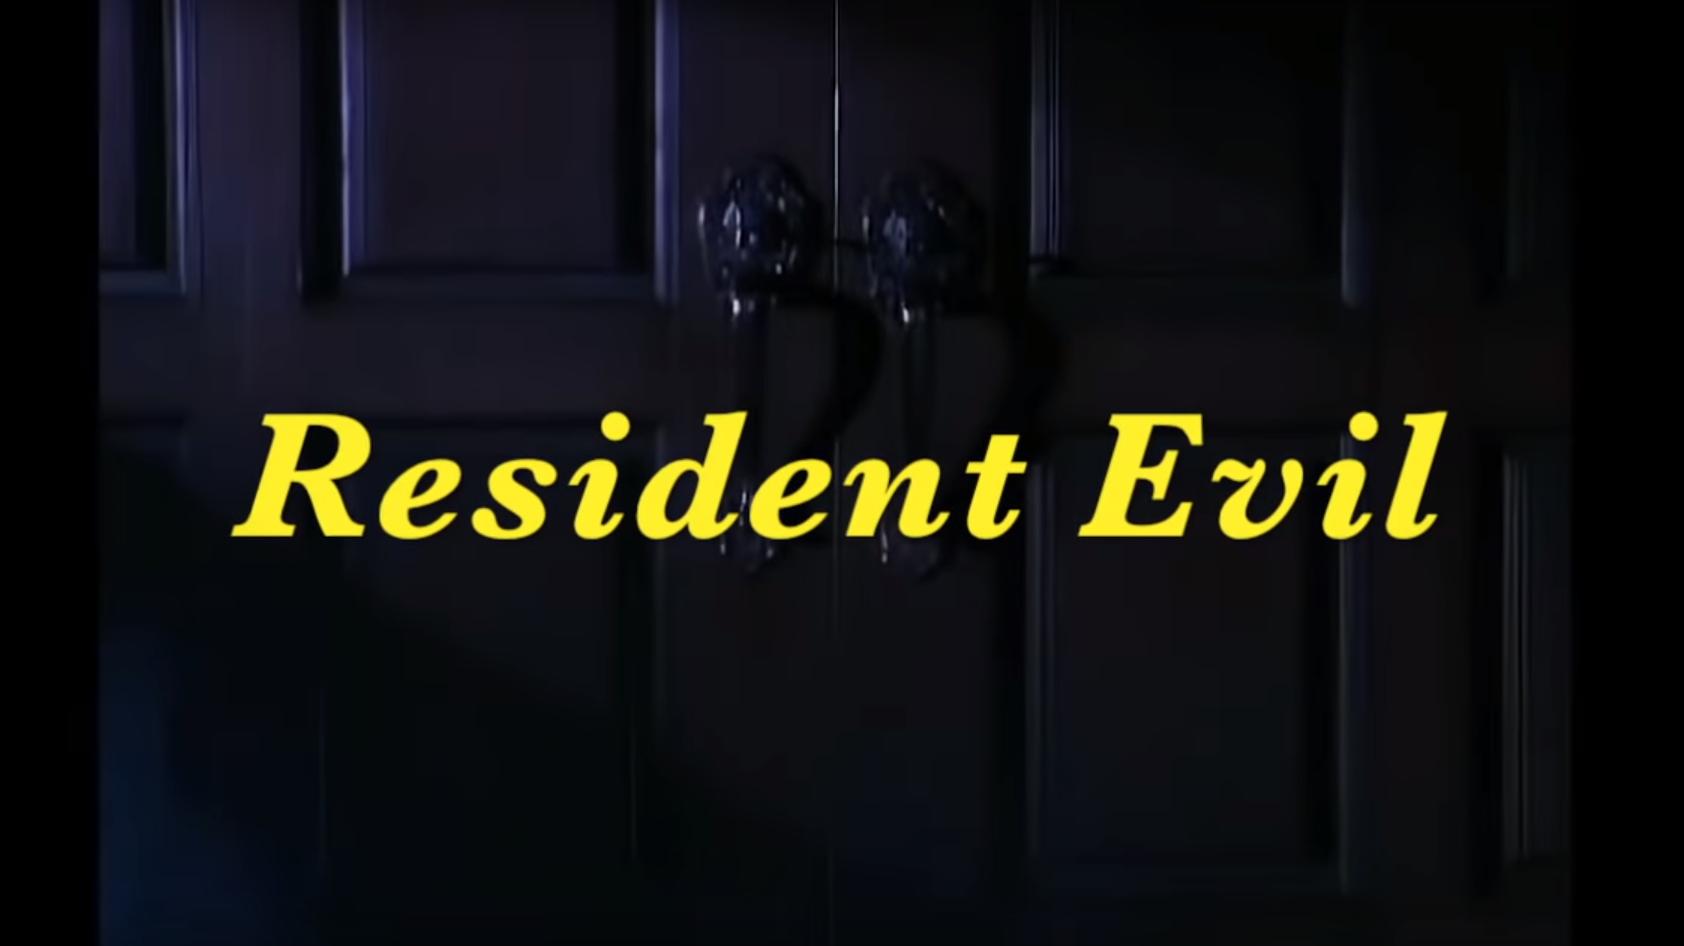 Original Resident Evil Intro Turned Into An 80s Sitcom